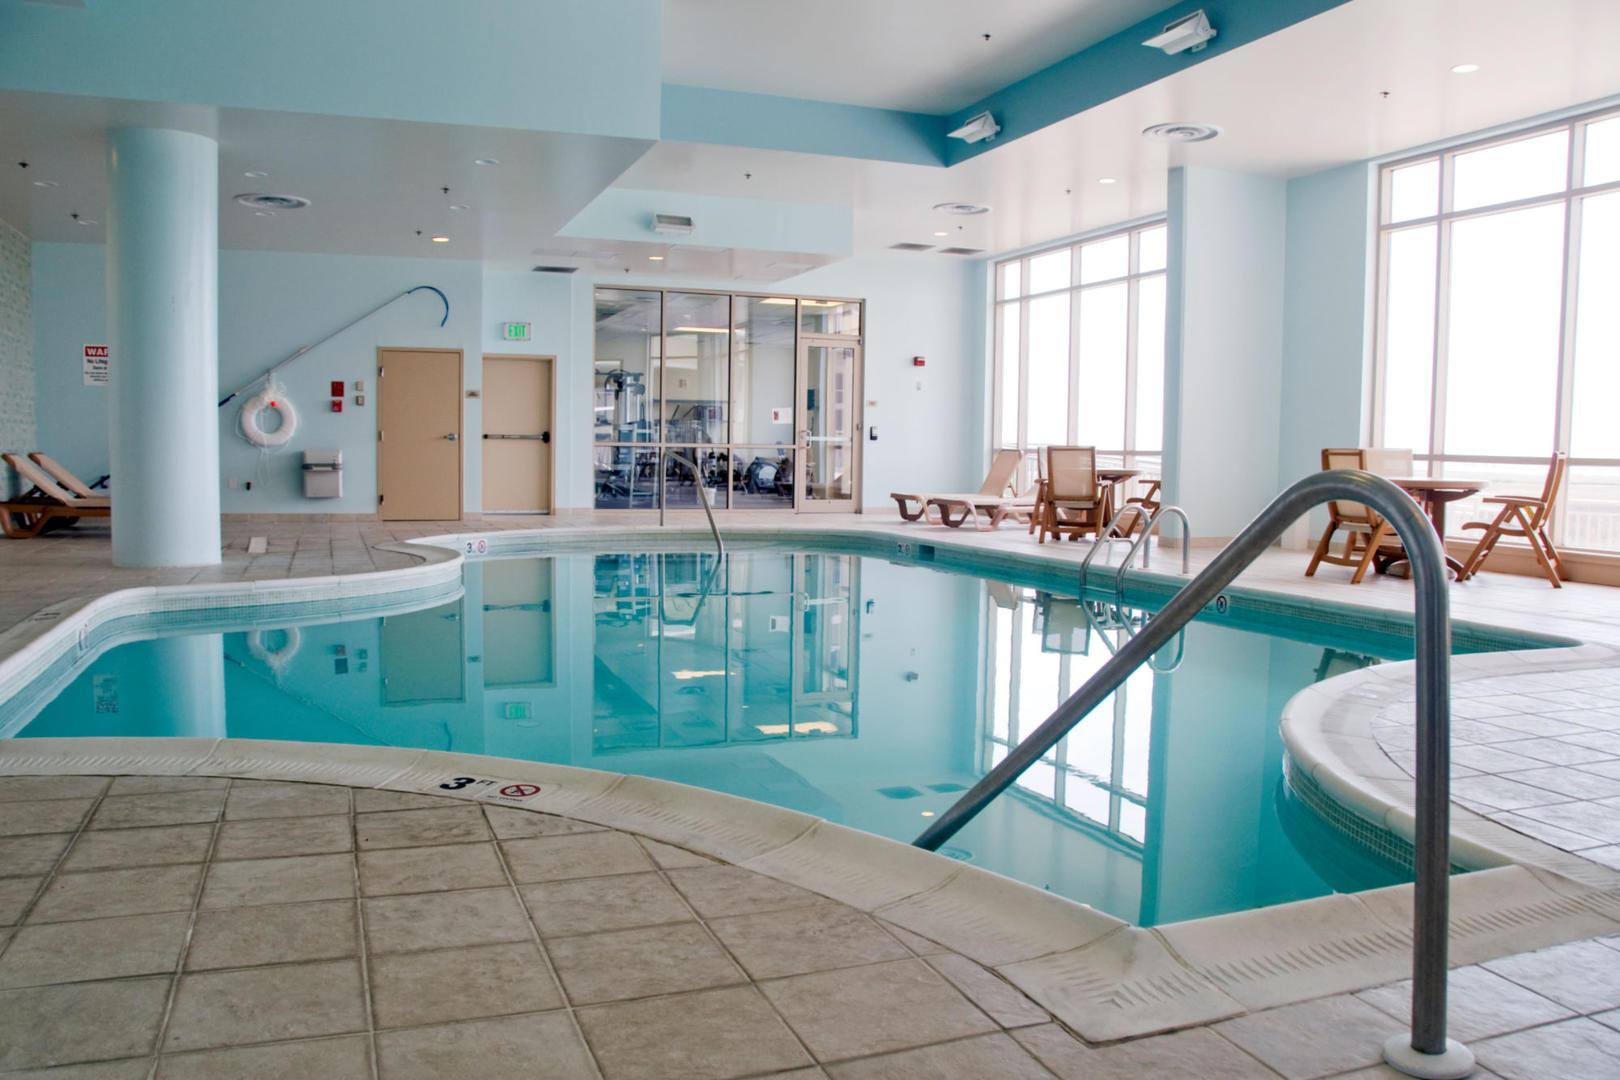 Rivendell - Indoor Pool